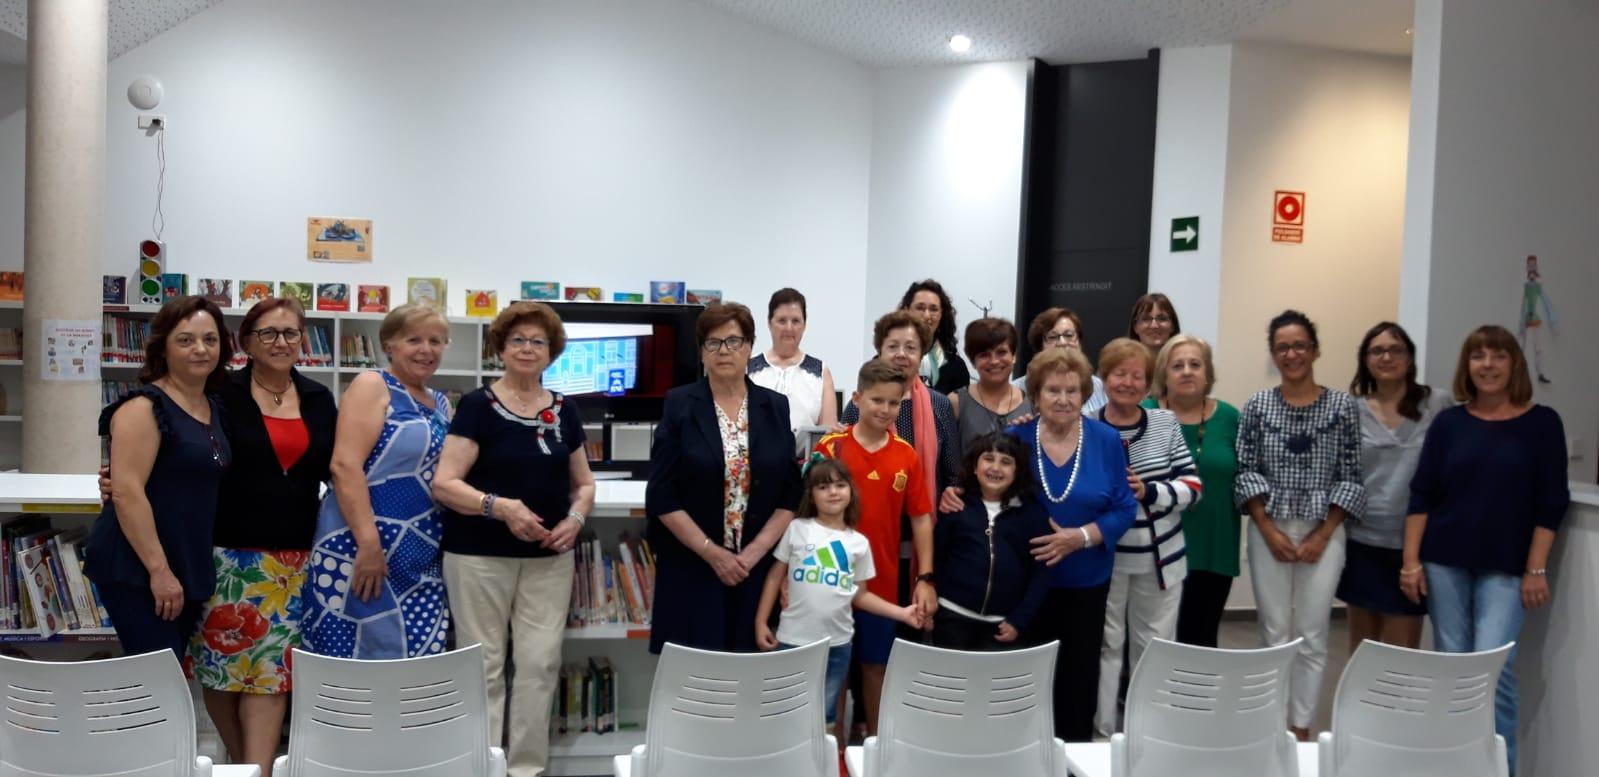 2019 Biblioteca Pública Municipal Maxi Banegas de Pinoso (Alicante)